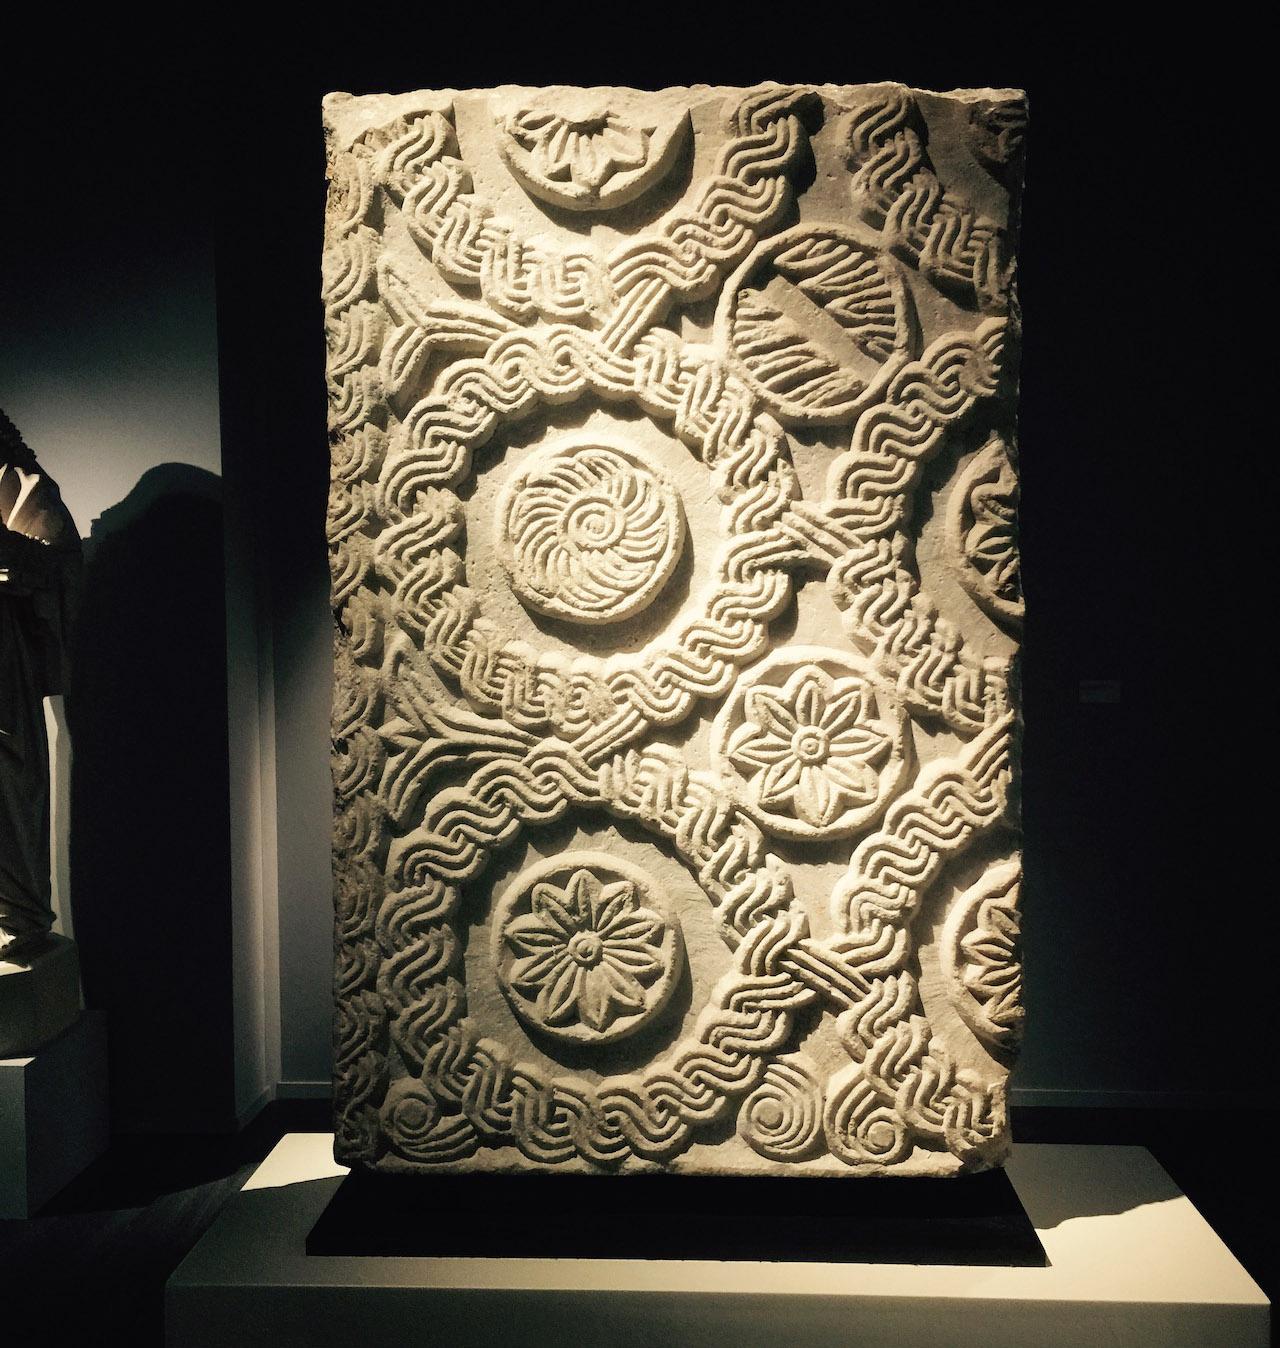 A Langobardic stele with a Renaissance-era inscription on its back, at Frieze Masters